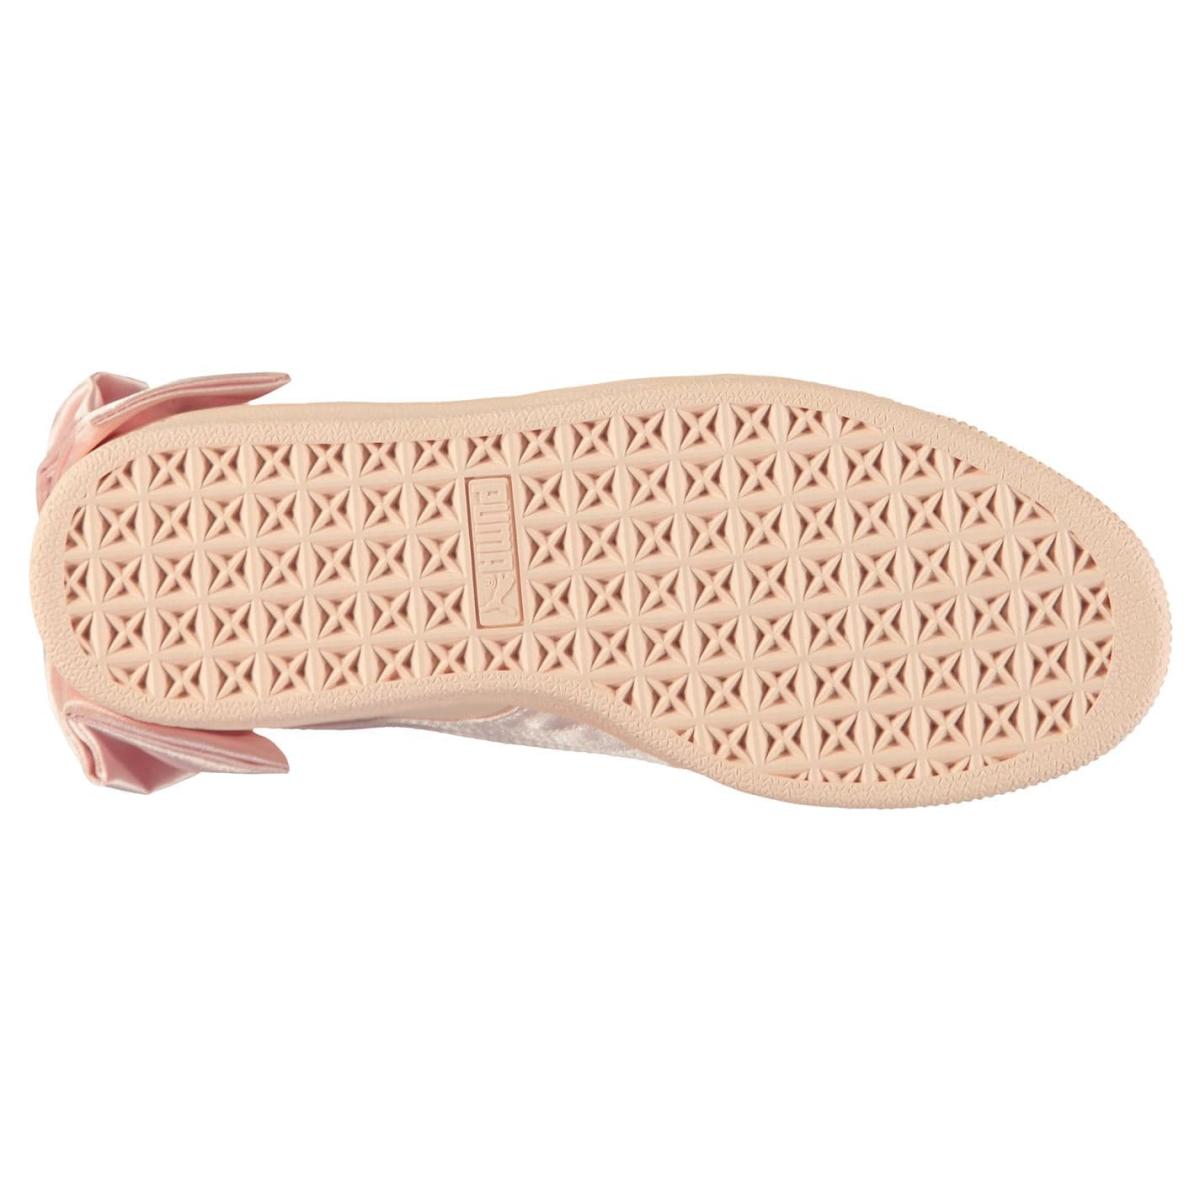 Puma-Basket-Turnschuhe-Damen-Sneaker-Sportschuhe-Laufschuhe-9061 Indexbild 3